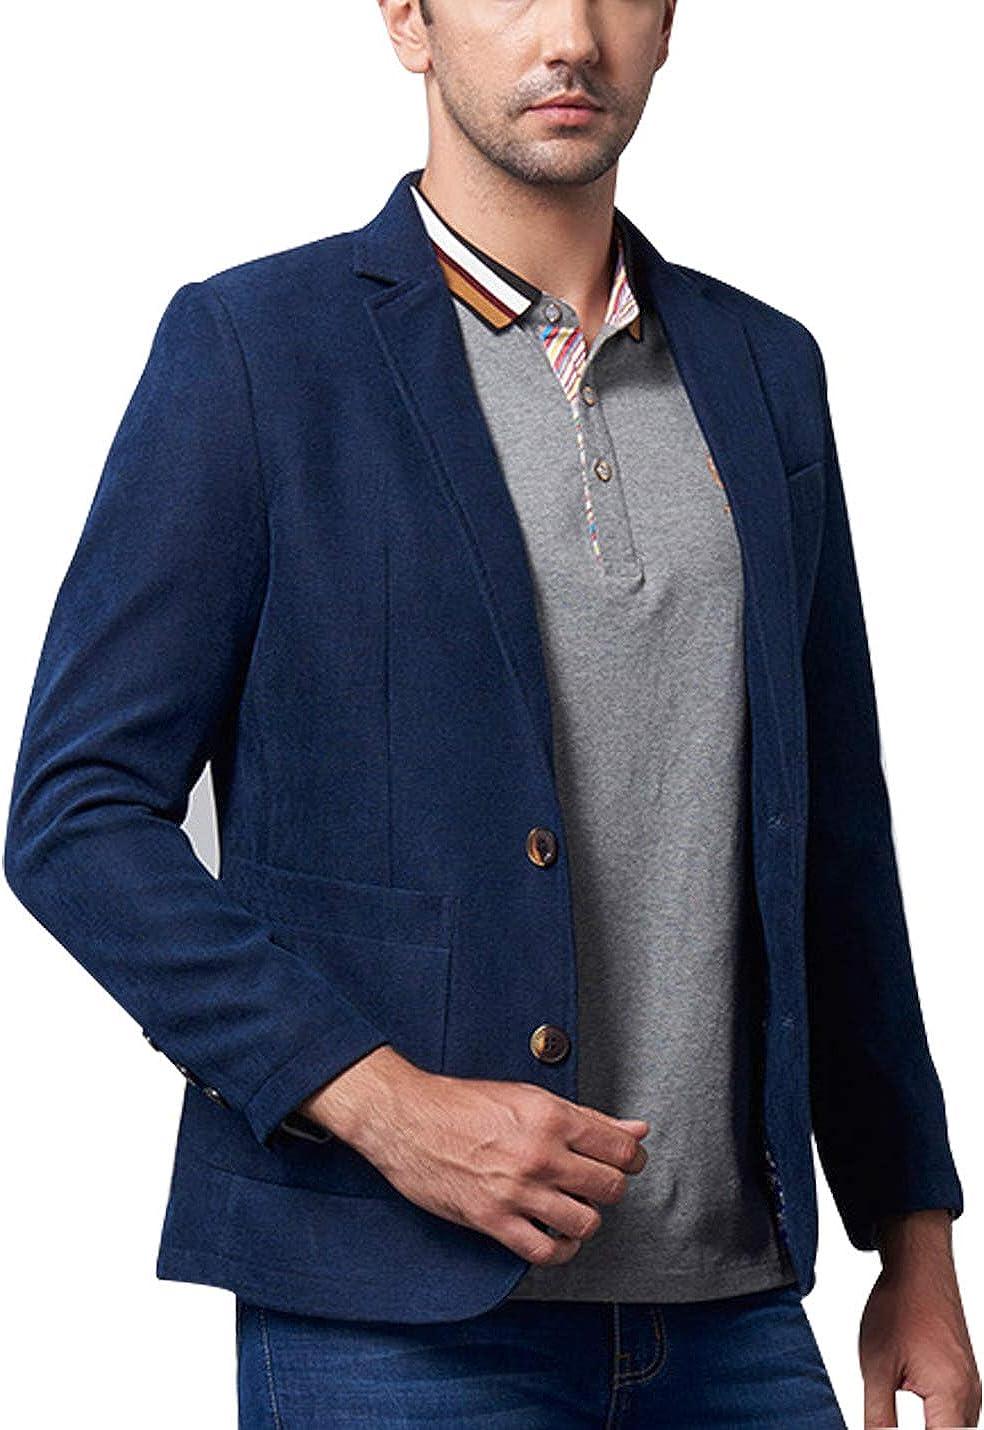 Omoone Men's Casual Lapel 2 Button Suits Slim Blazer Jacket Sports Coat